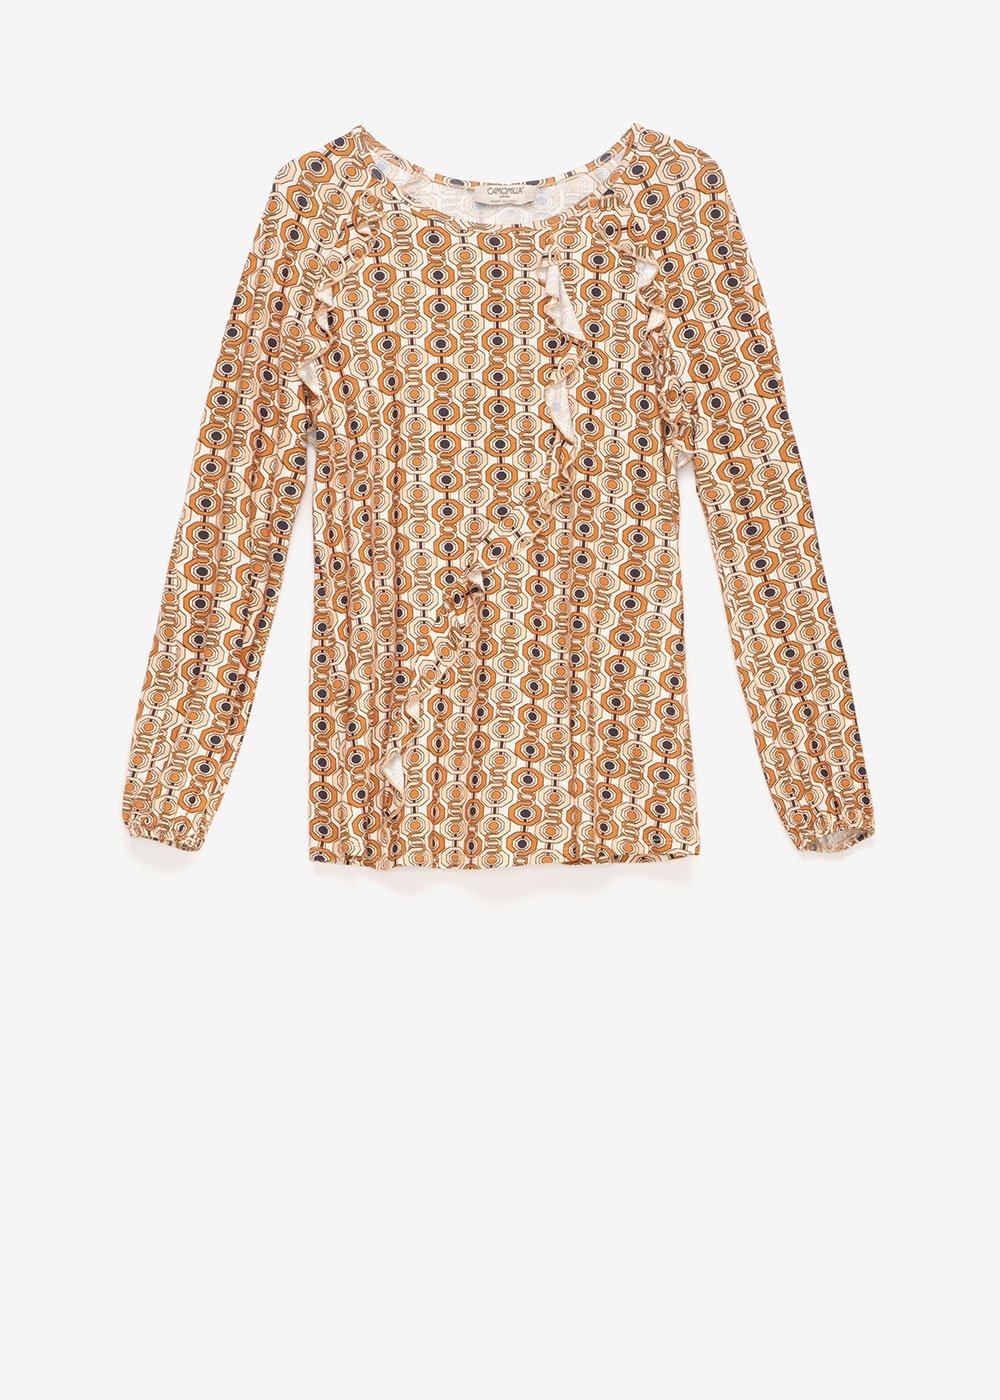 Shila T-shirt with chain print - Cream / Honey Multi - Woman